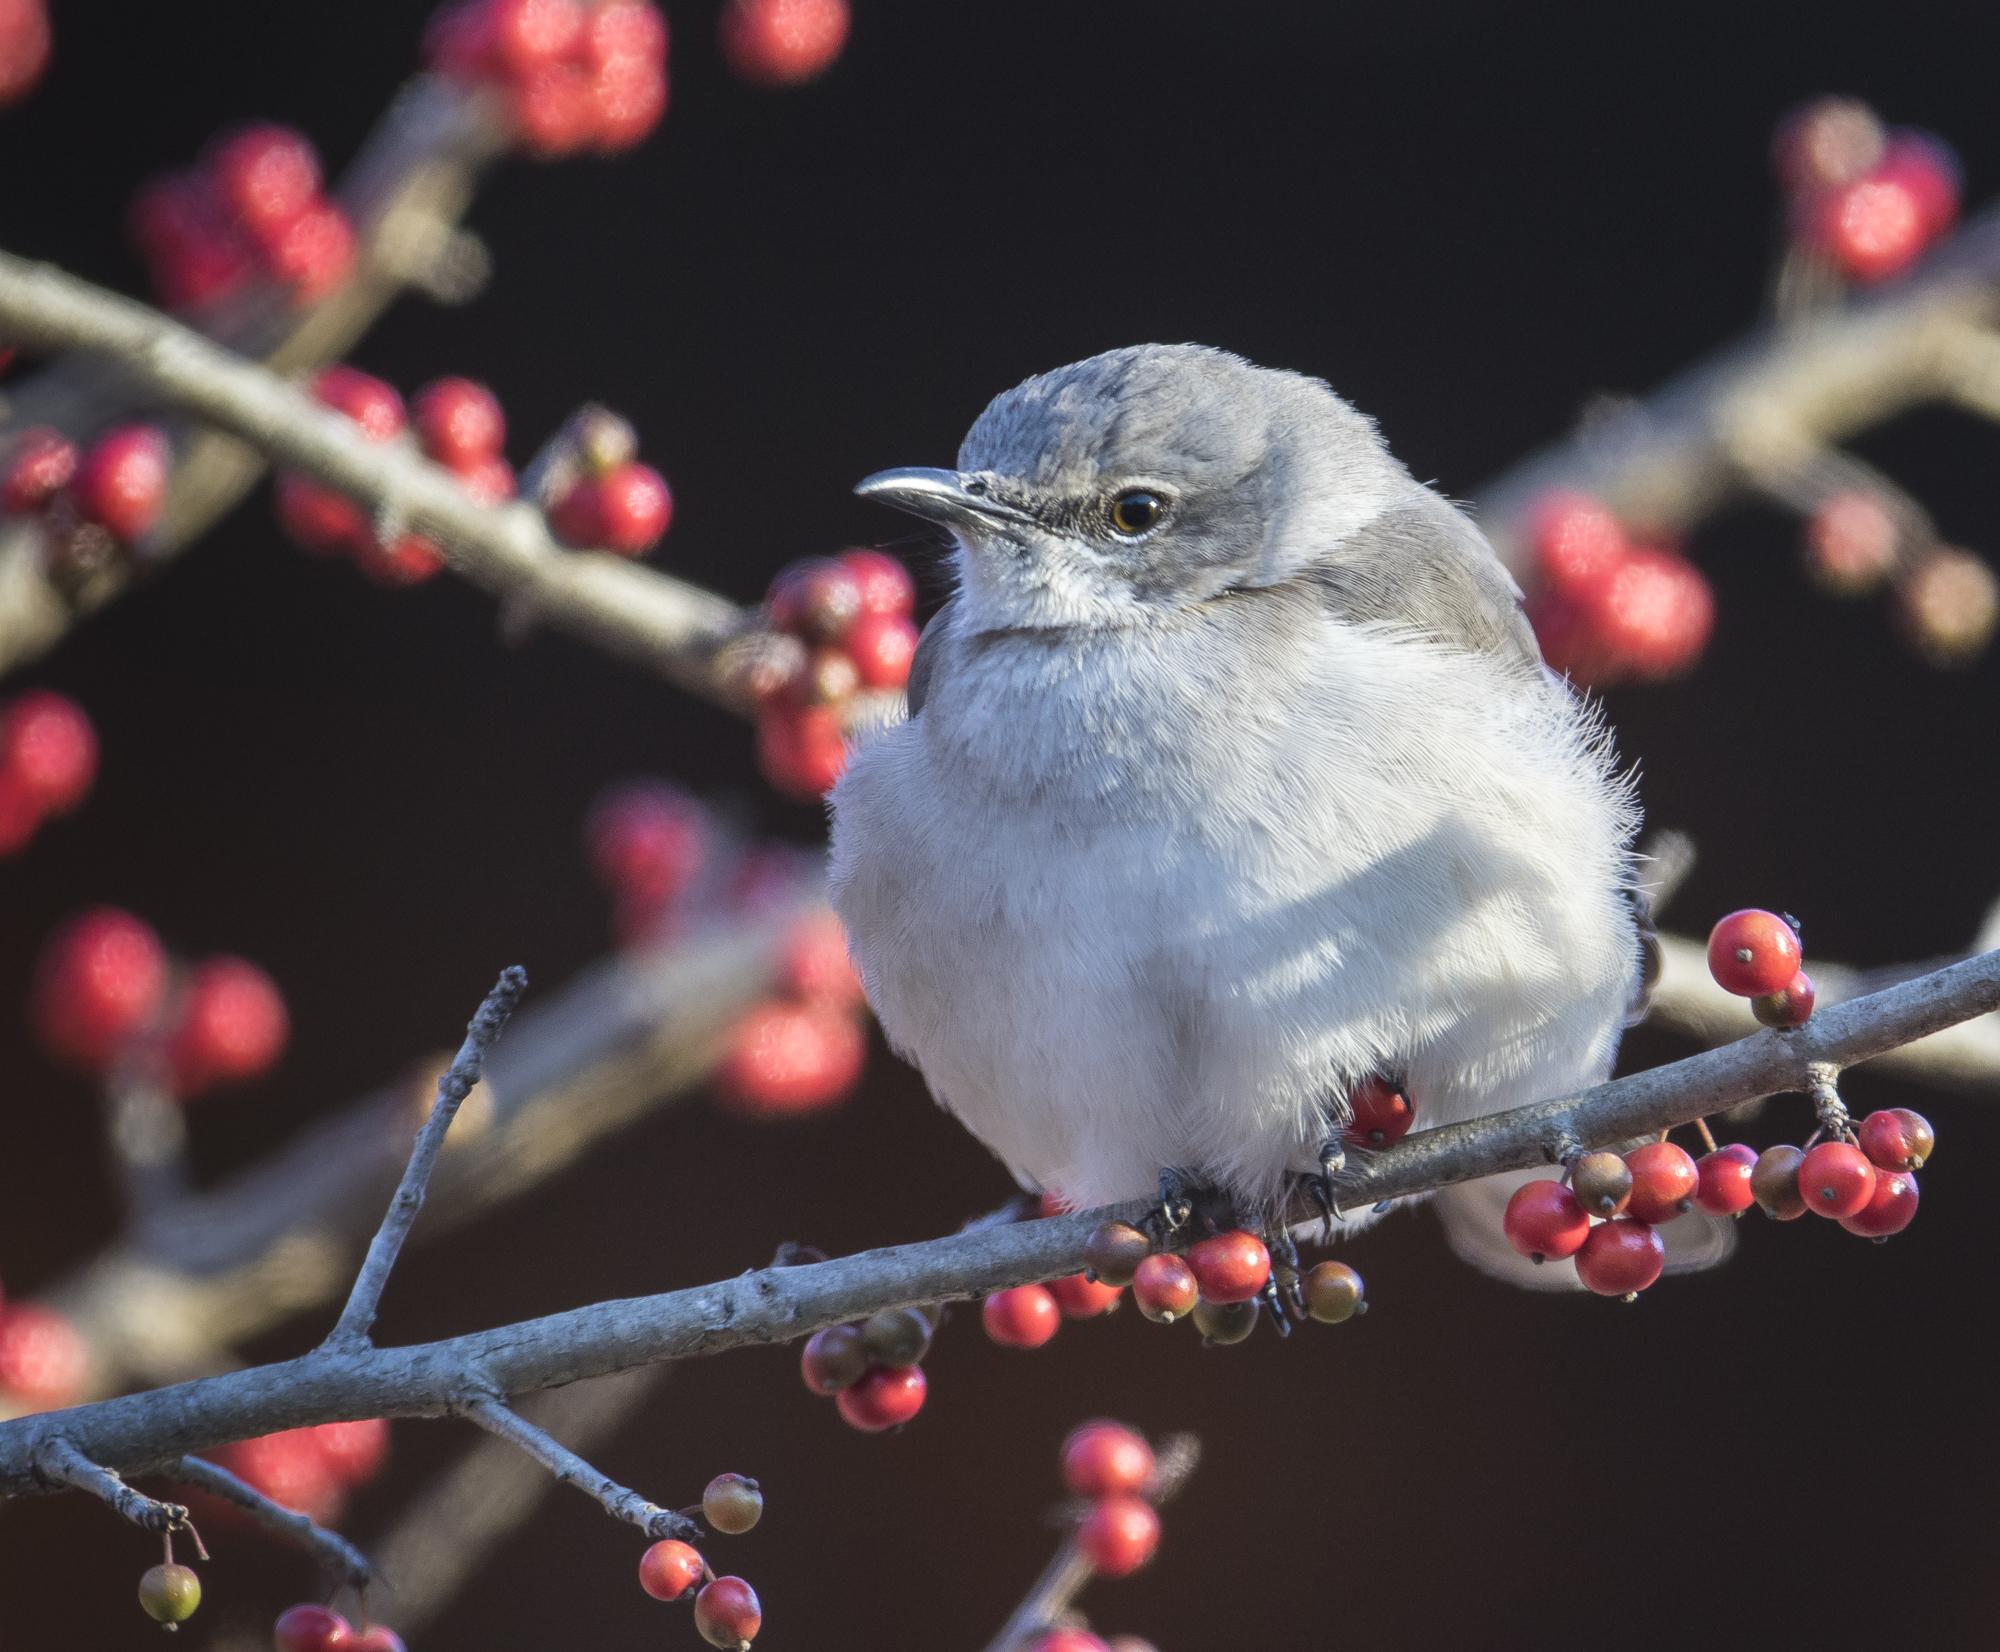 Northern mockingbird with berries